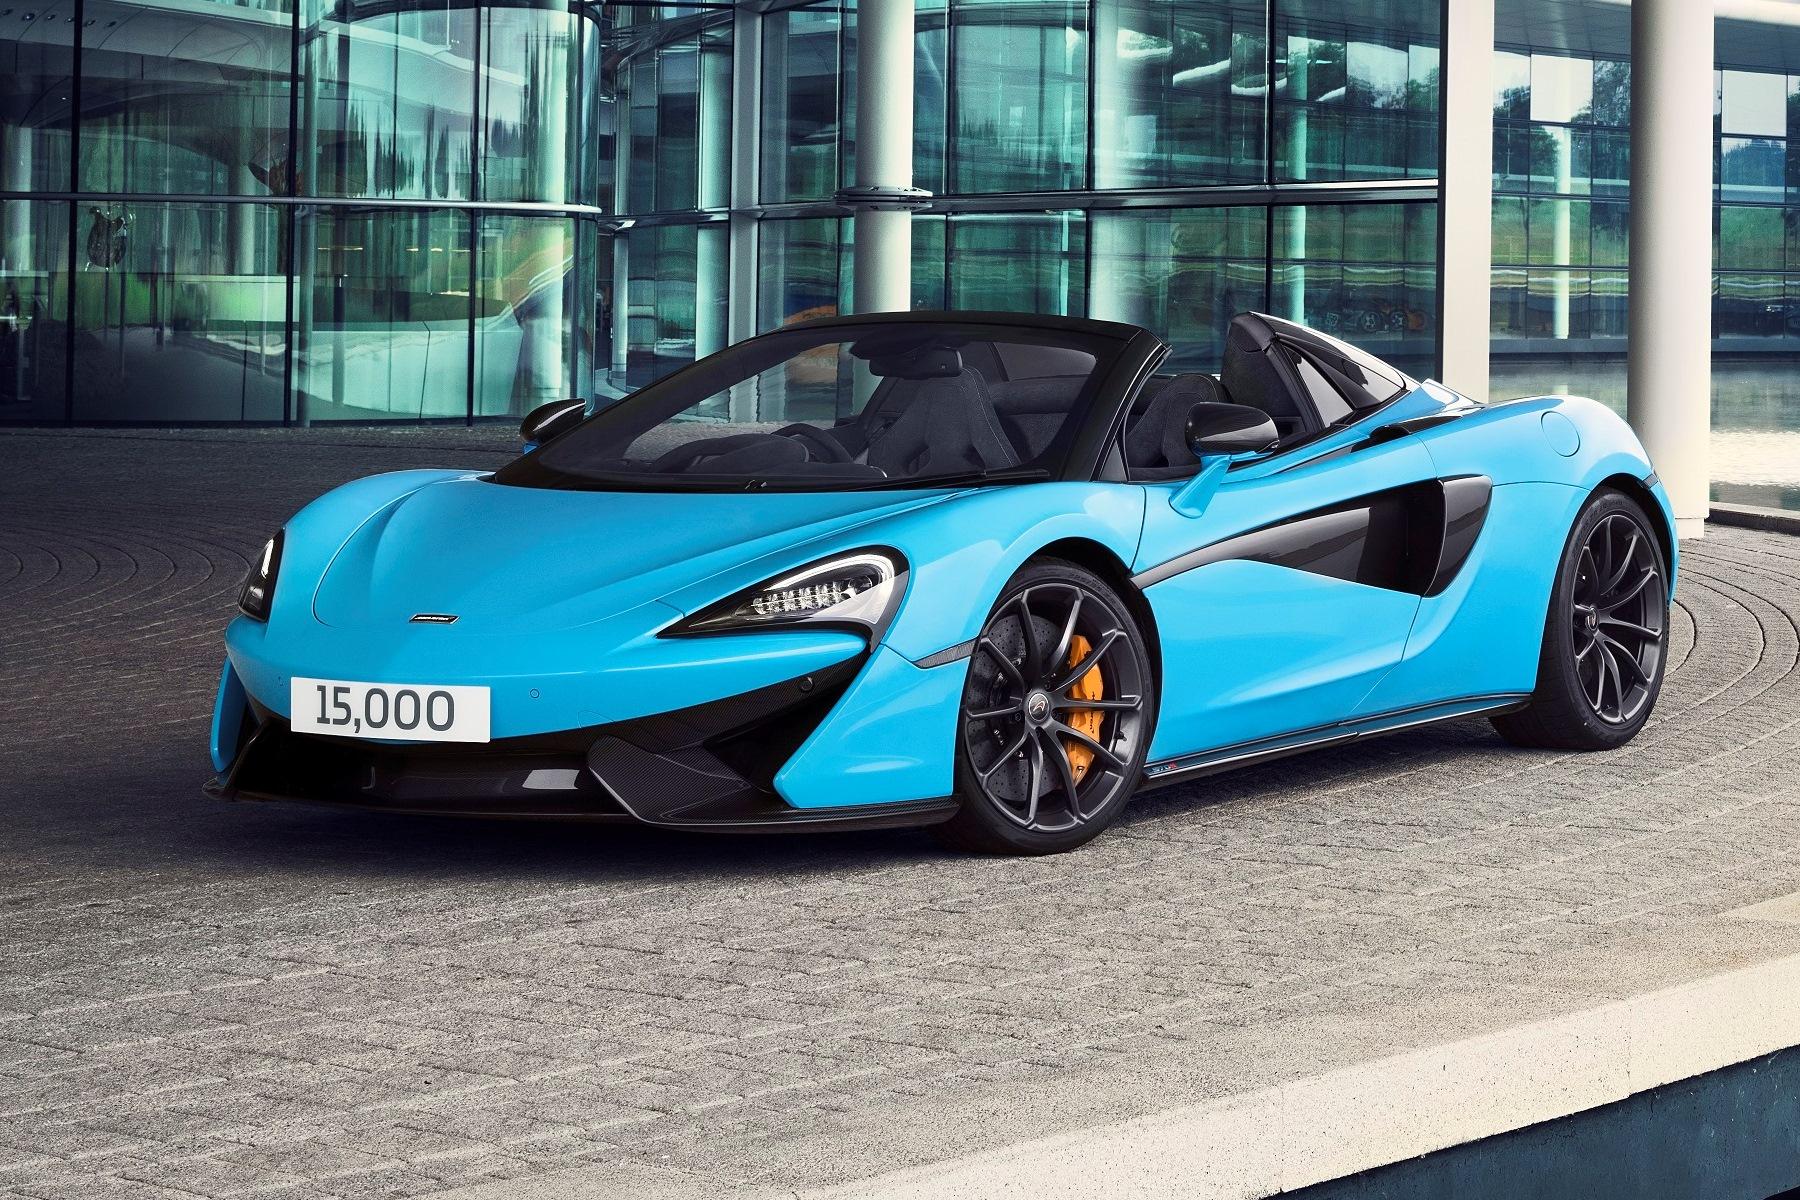 McLaren Automotive 15000th car - 570S Spider